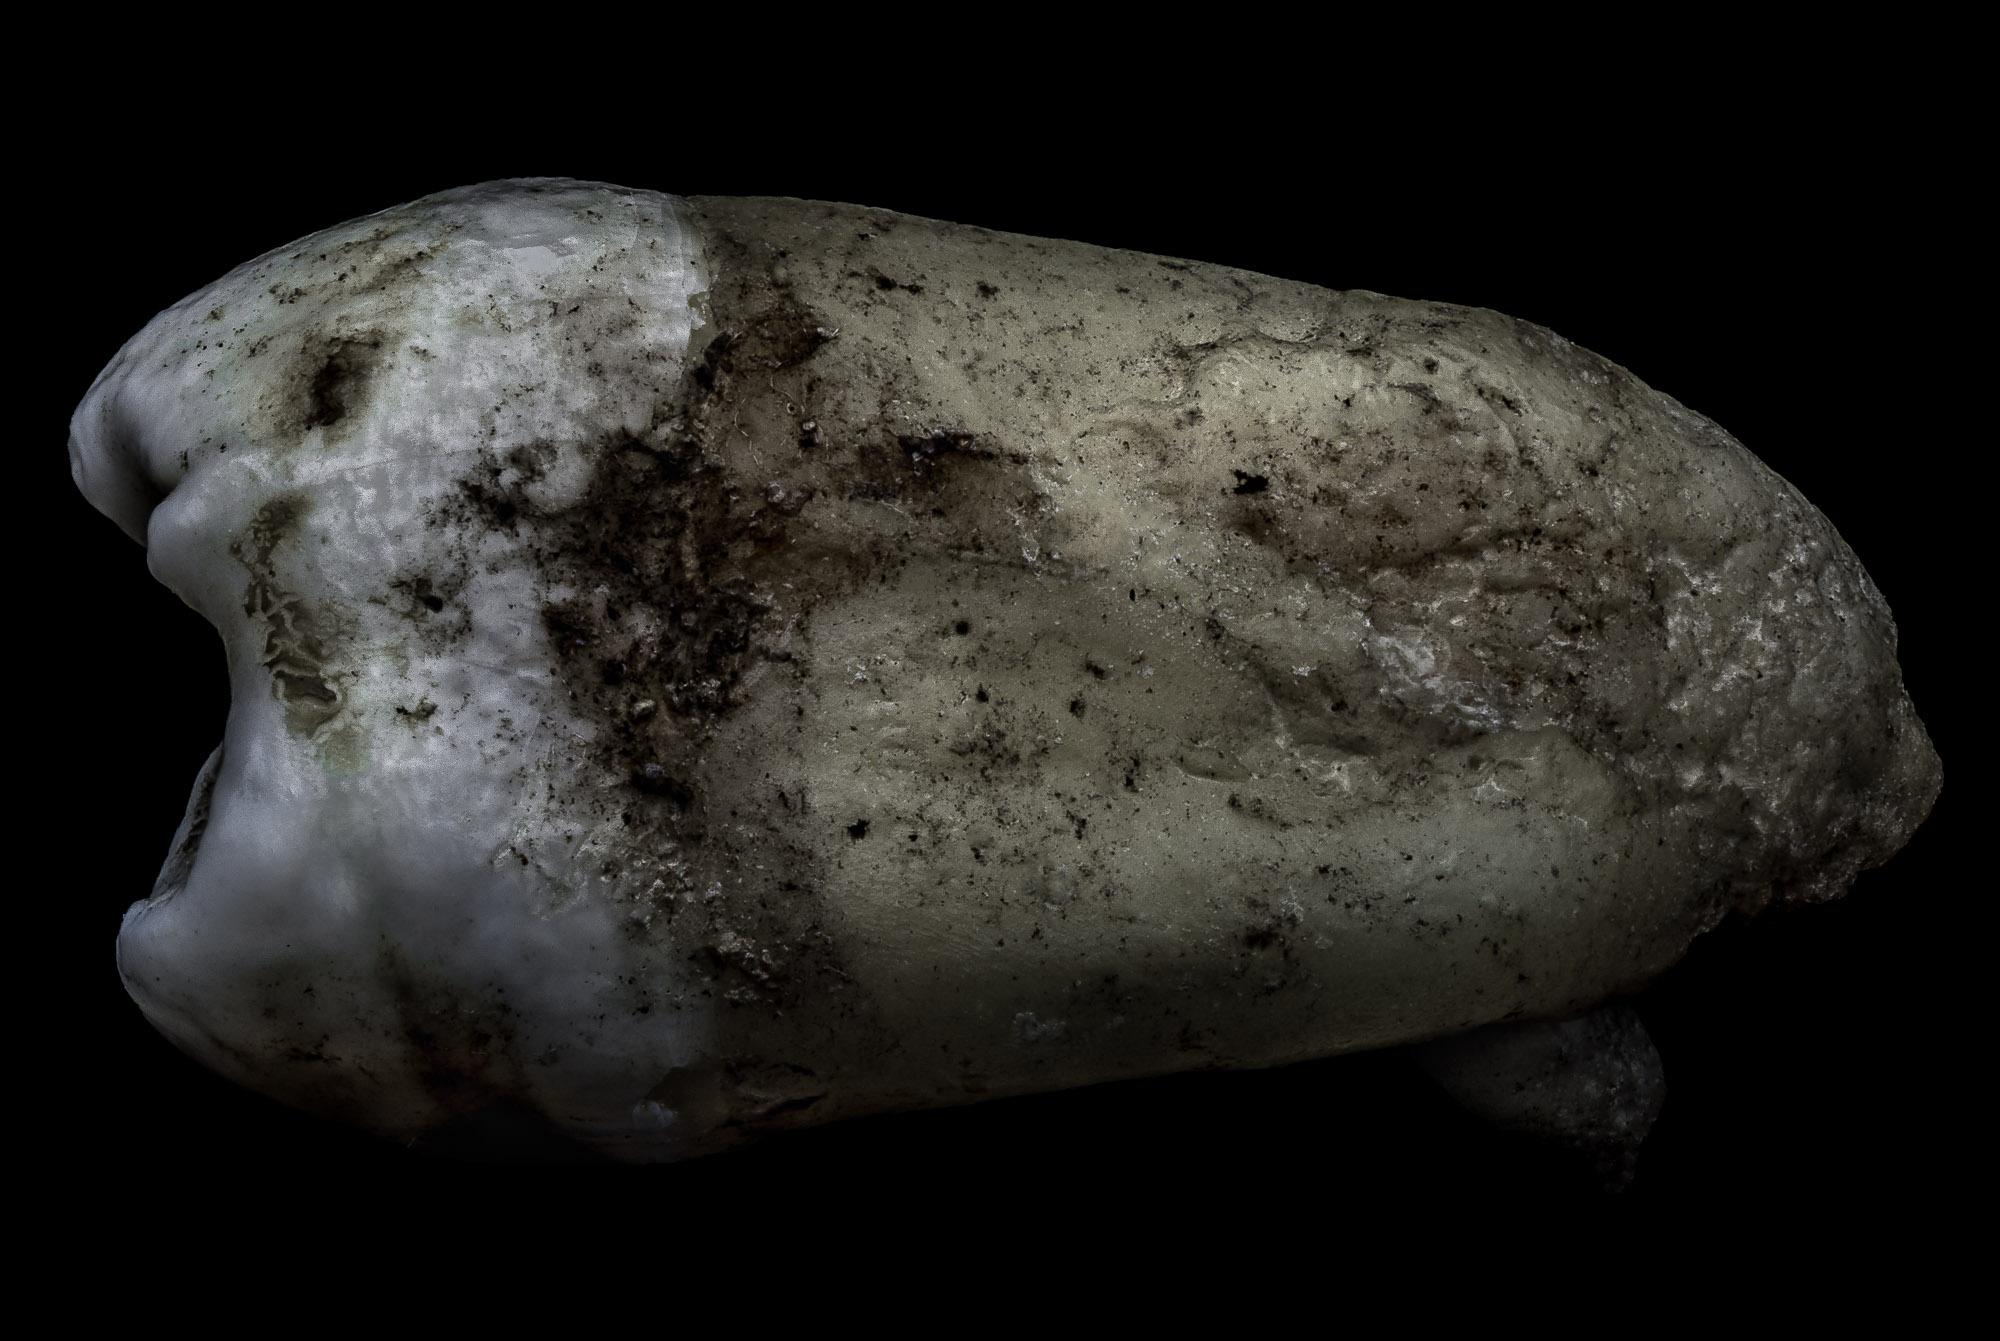 neal-auch-human-teeth-photographs-7.jpg